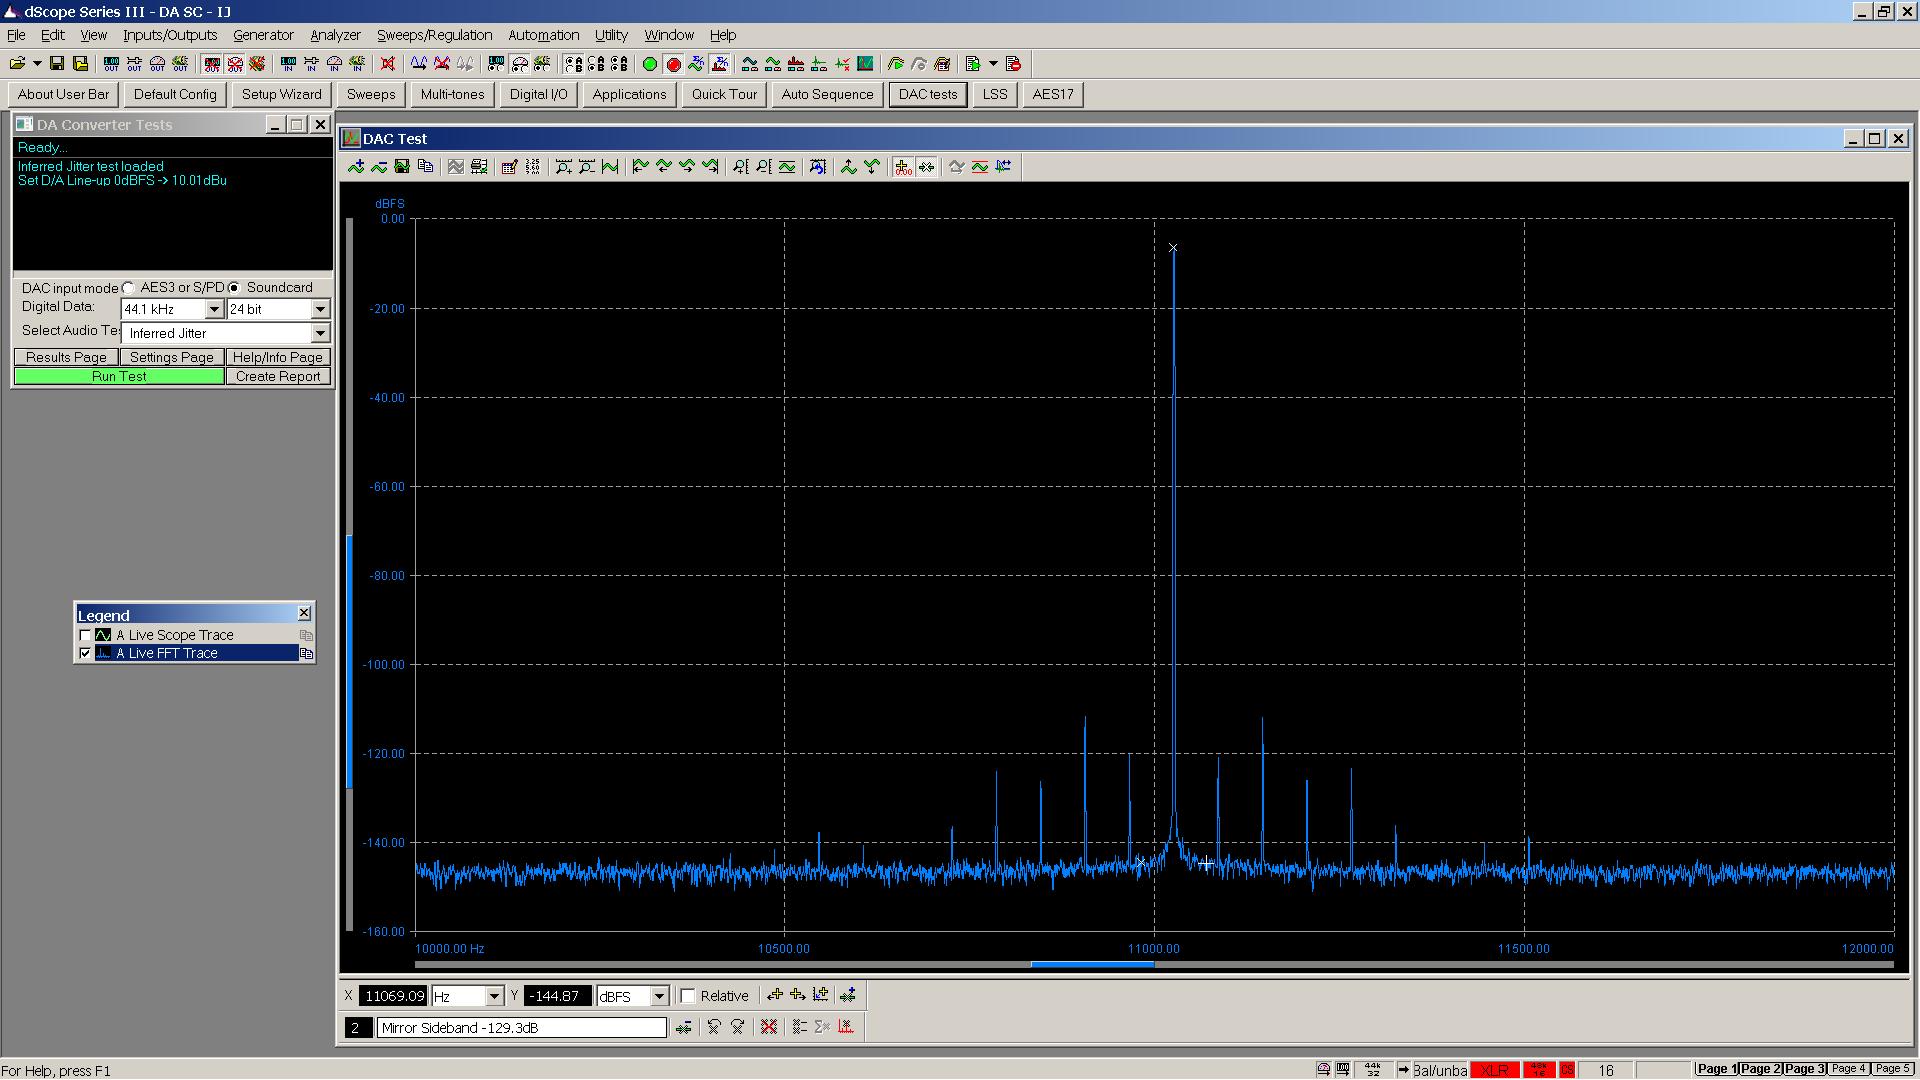 20170423 Audio-gd S19 SE inferred jitter - 2KHz BW - USB.PNG